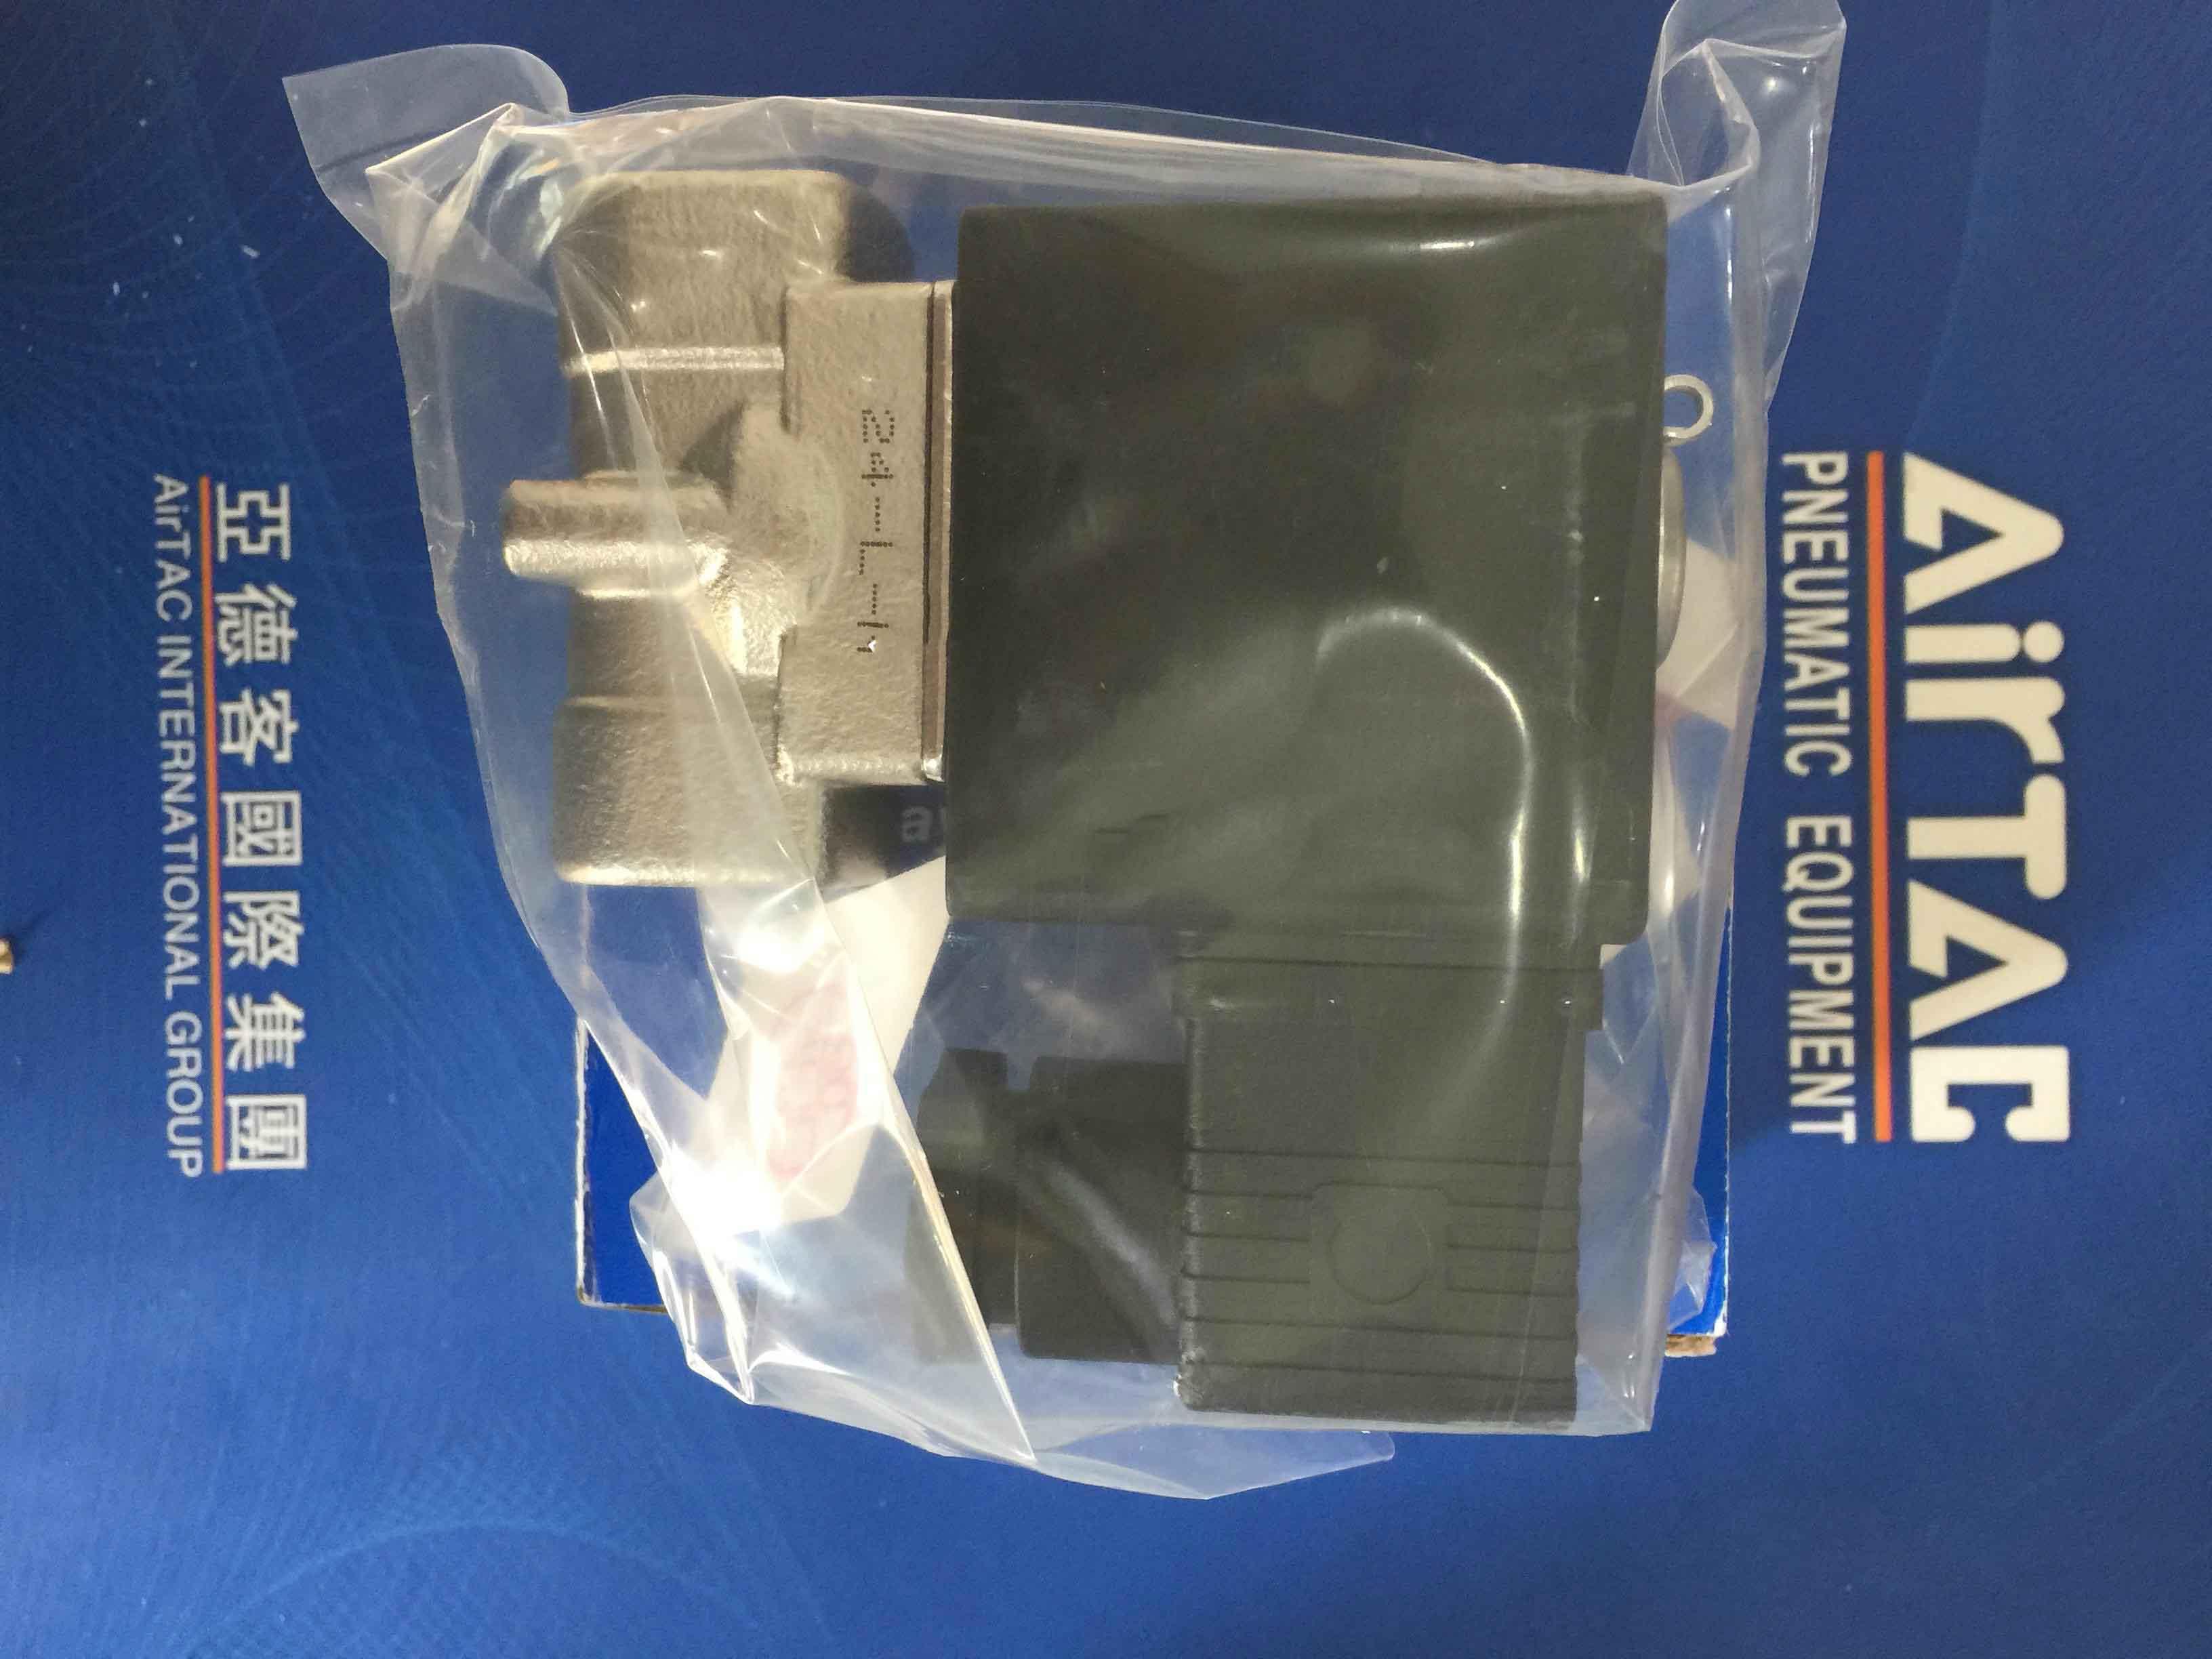 The original Yadeke AIRTAC stainless steel open steam solenoid valve 2KL050-102KL050-15